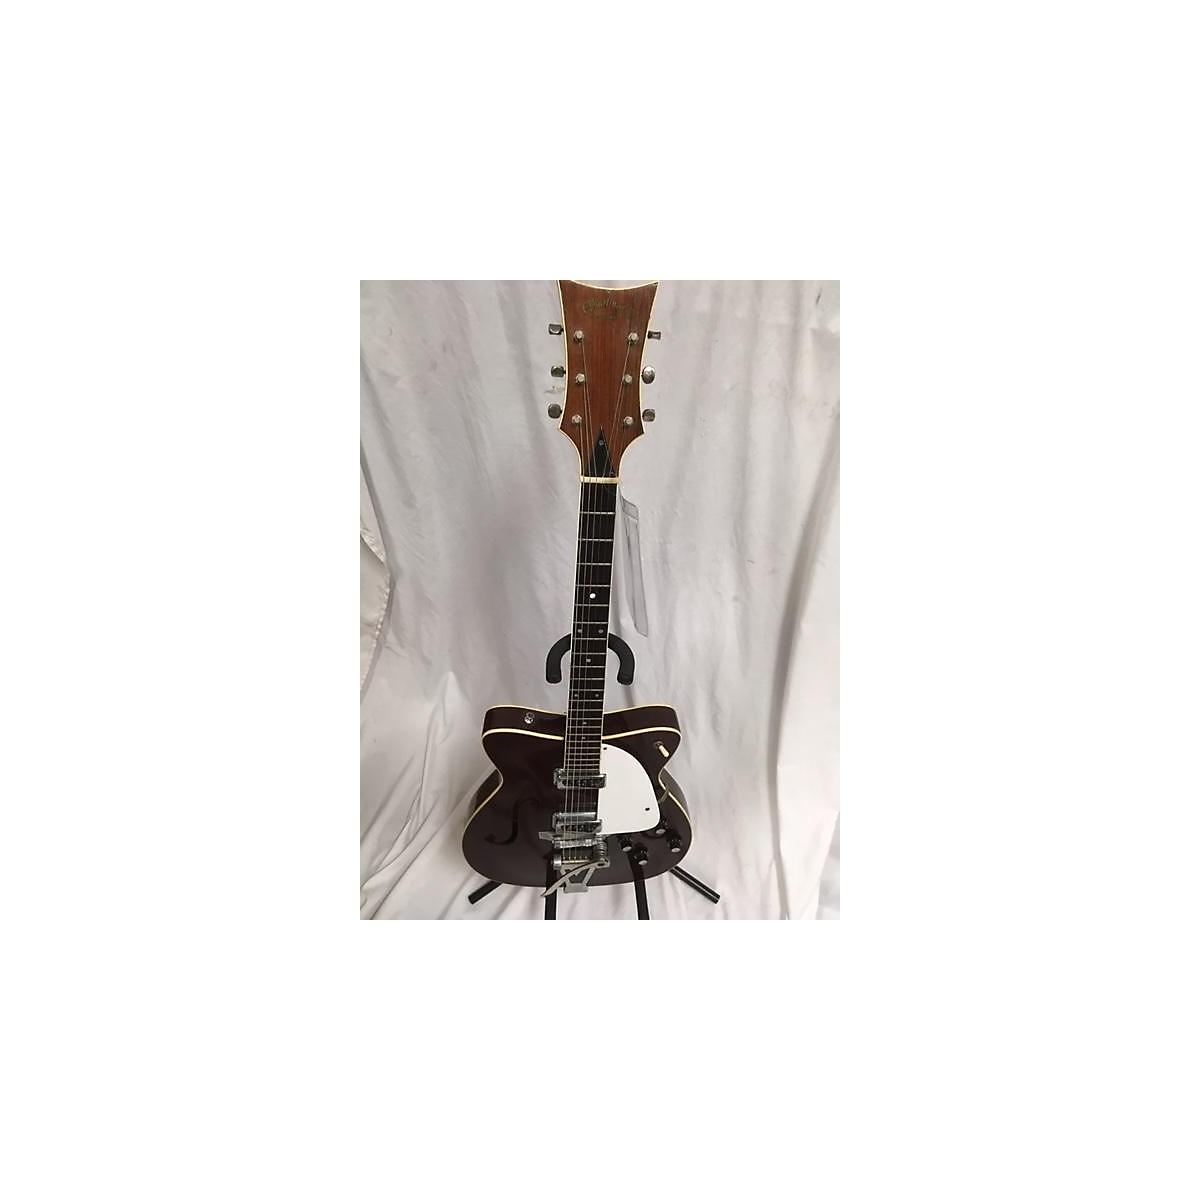 Martin 1966 GT-75 Hollow Body Electric Guitar